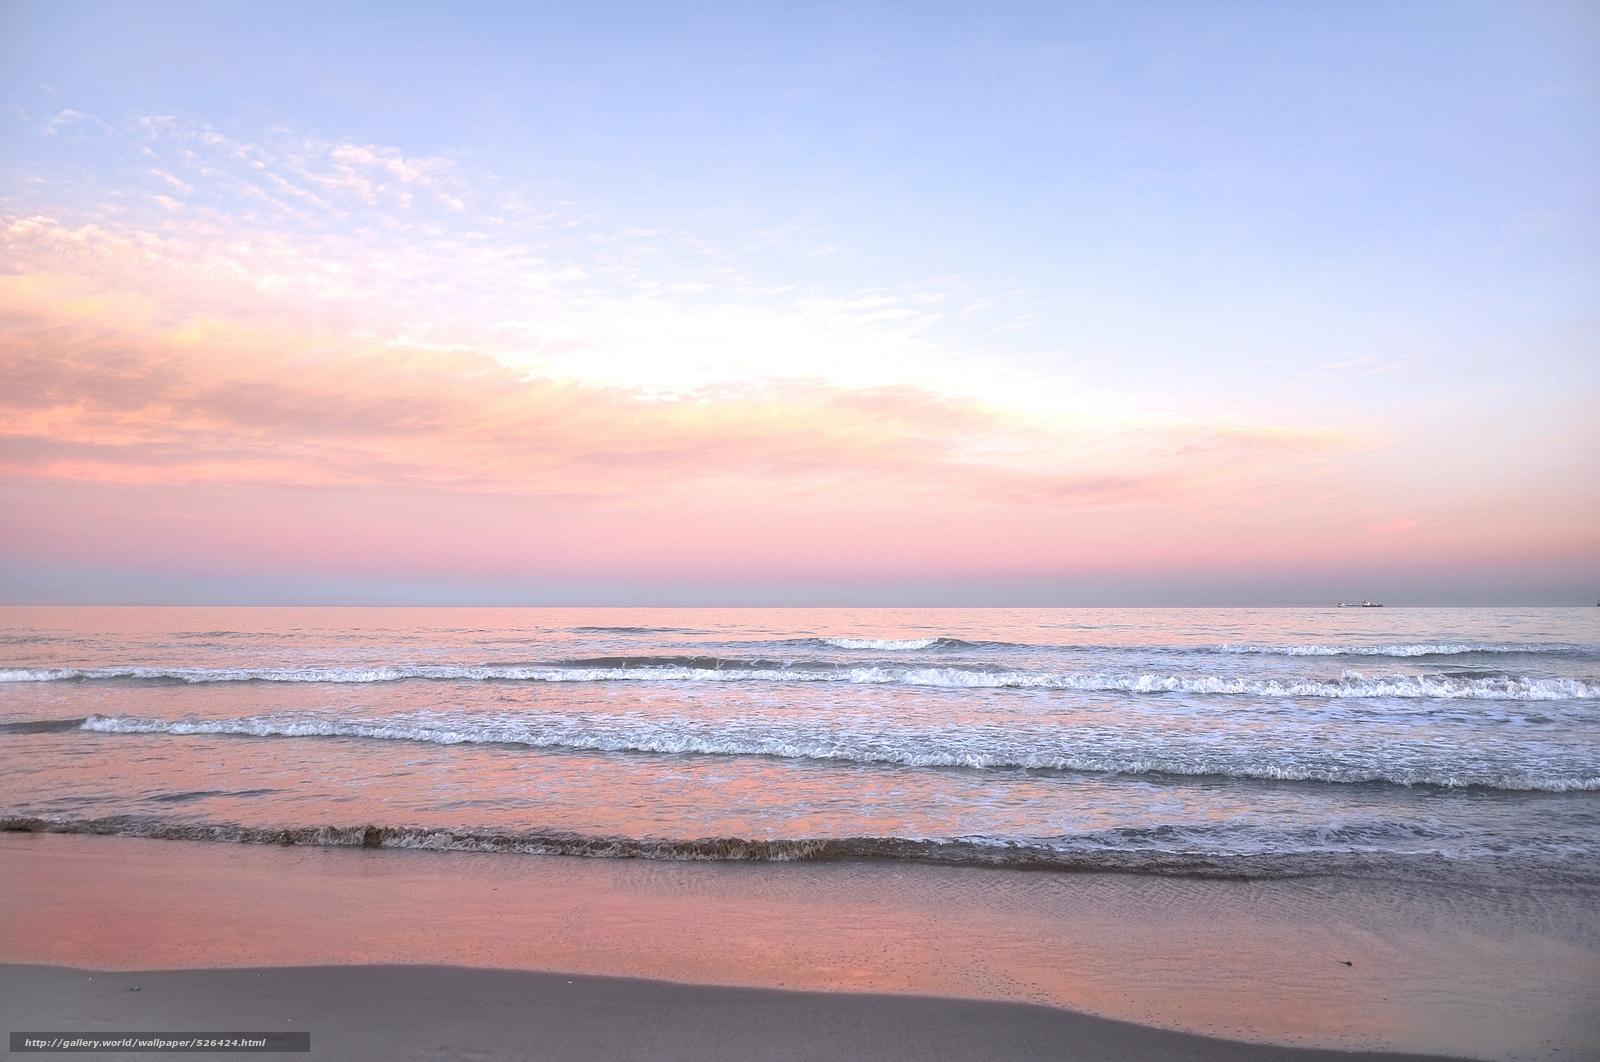 Tlcharger fond d 39 ecran lever du soleil mer cte flots for Fond ecran gratuit mer